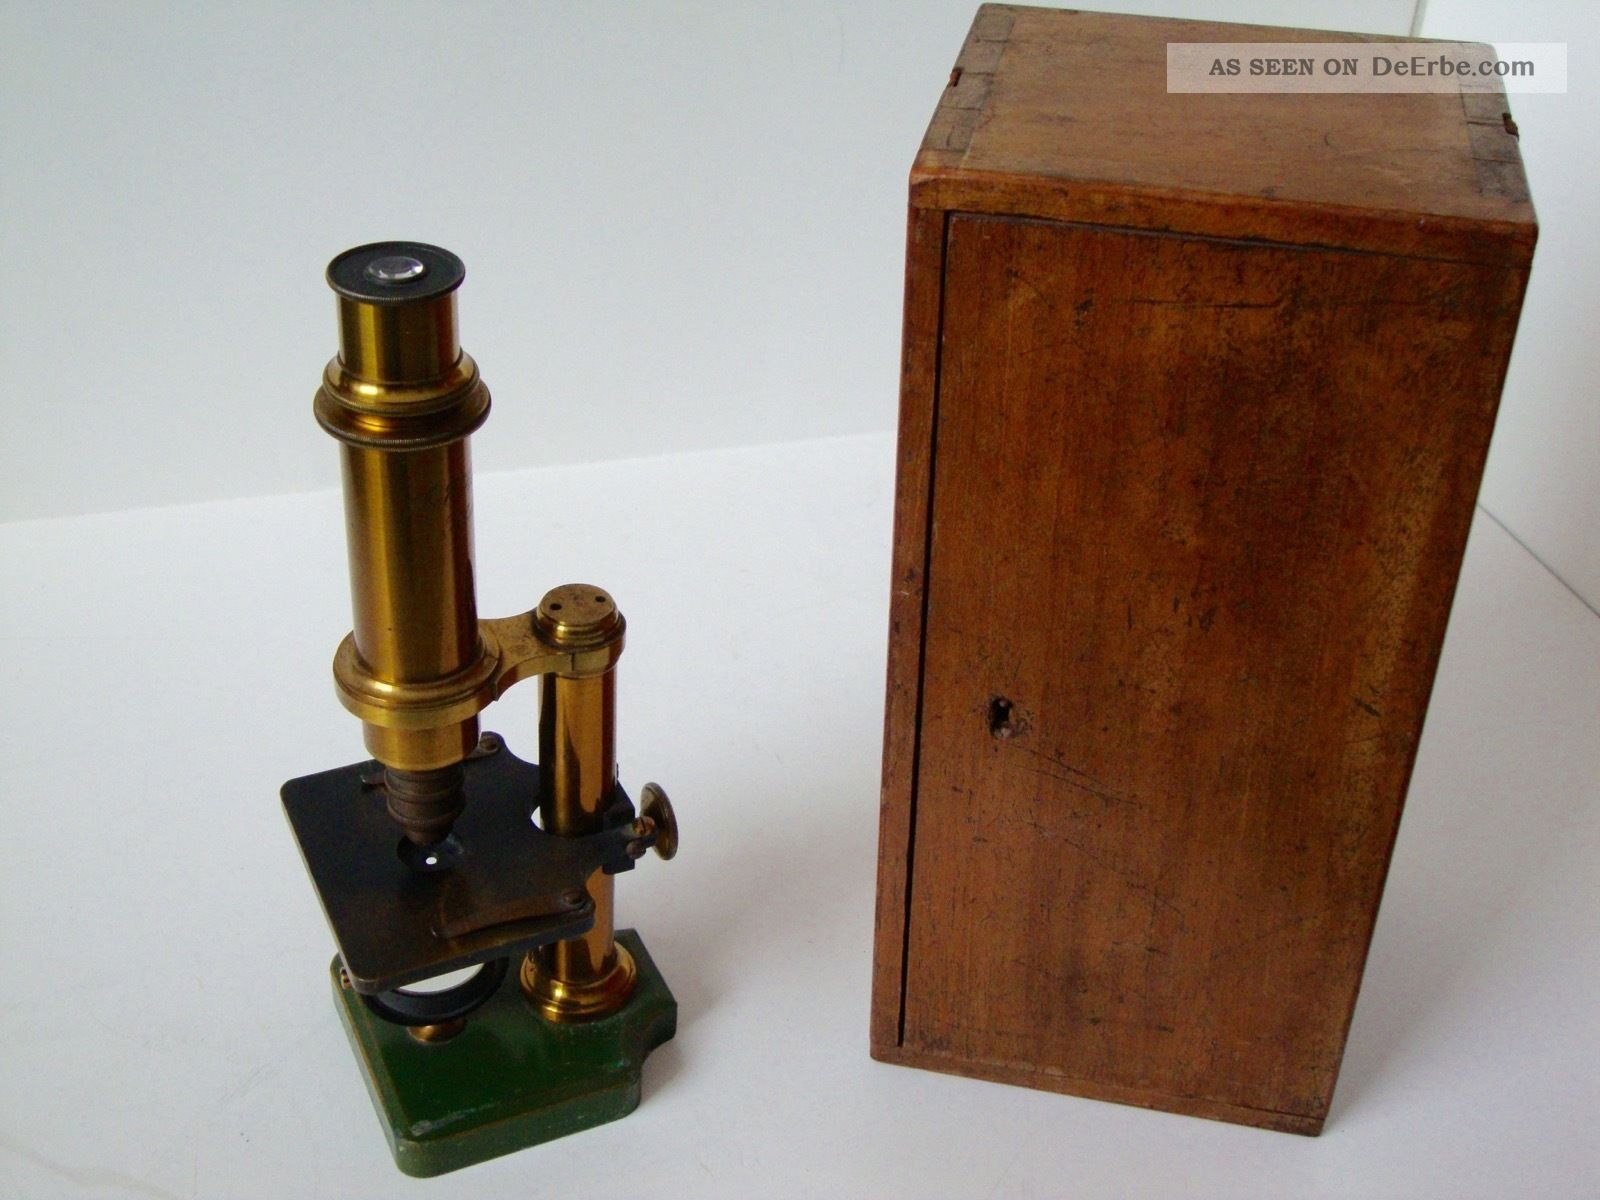 Mikroskop Aus Messing Um 19.  Jhd.  Dr.  E.  Hartnack Potsdam Optiker Bild